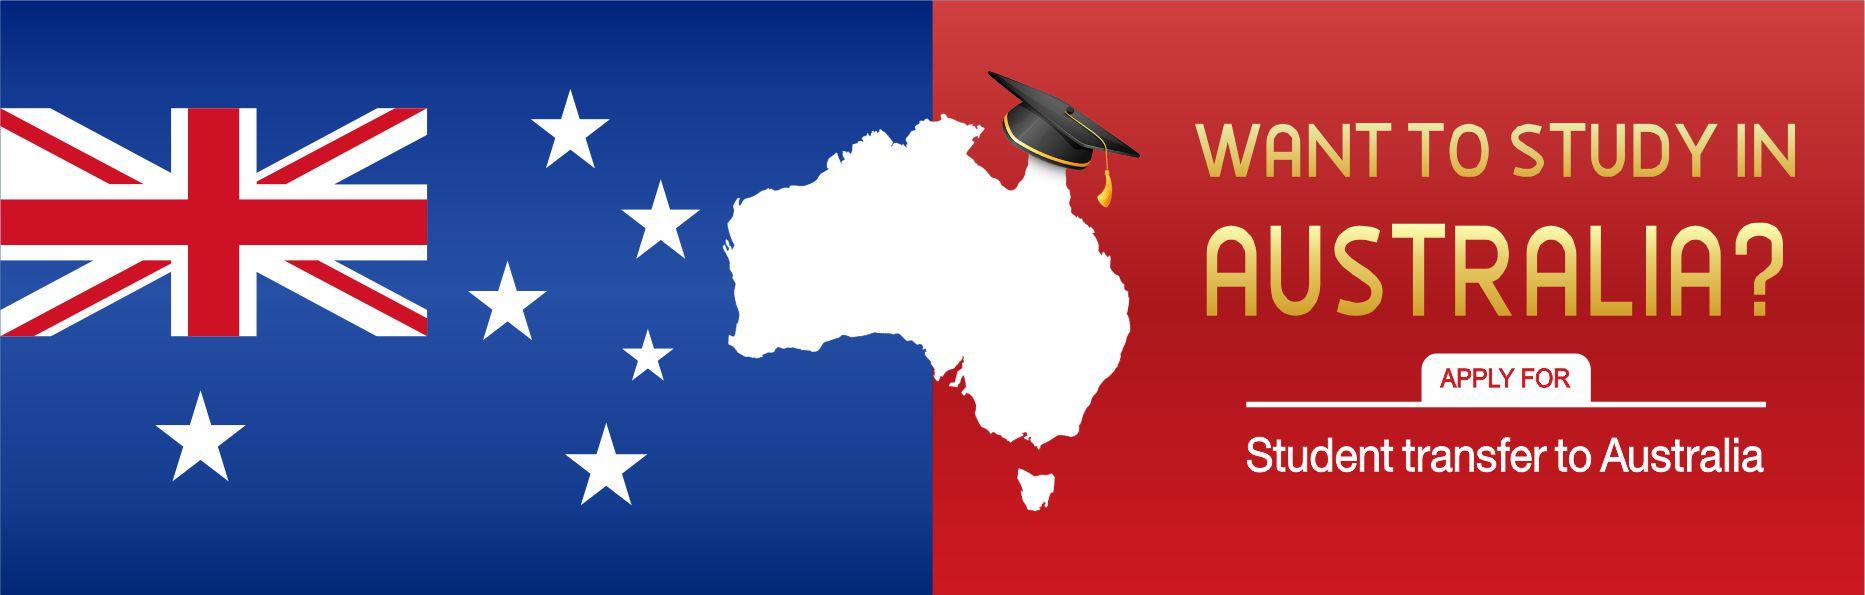 about australia